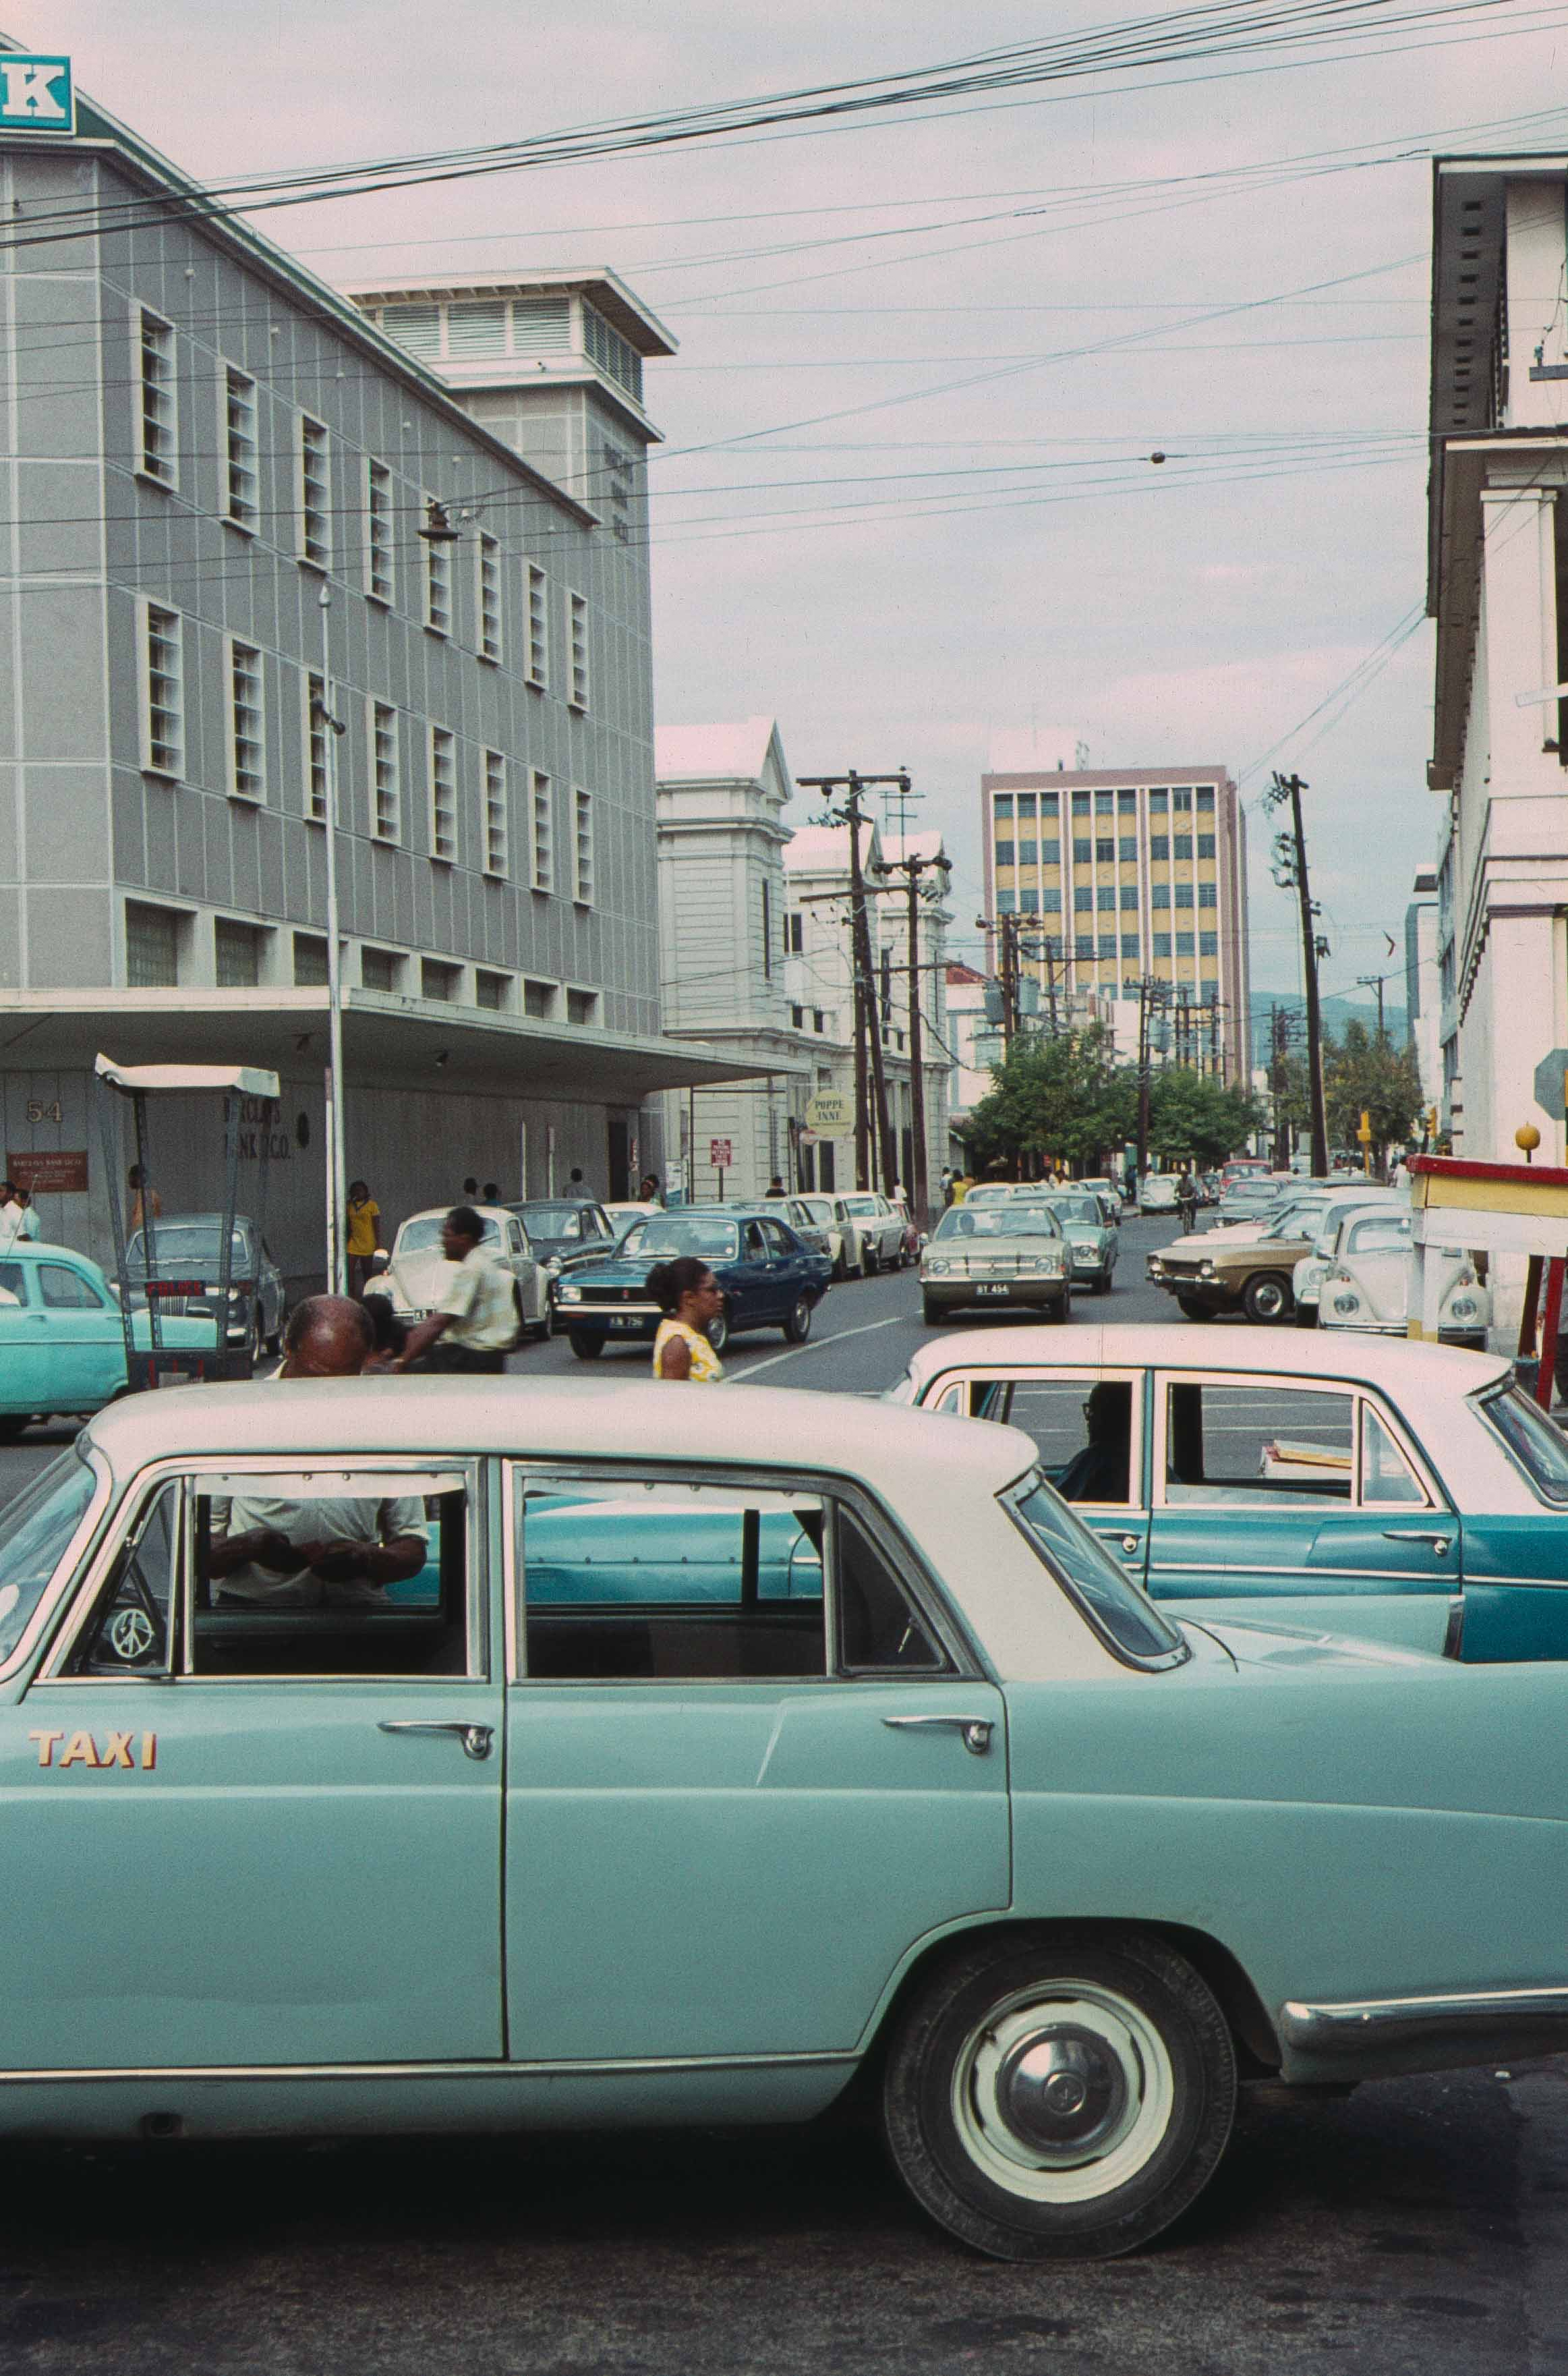 669. Suriname